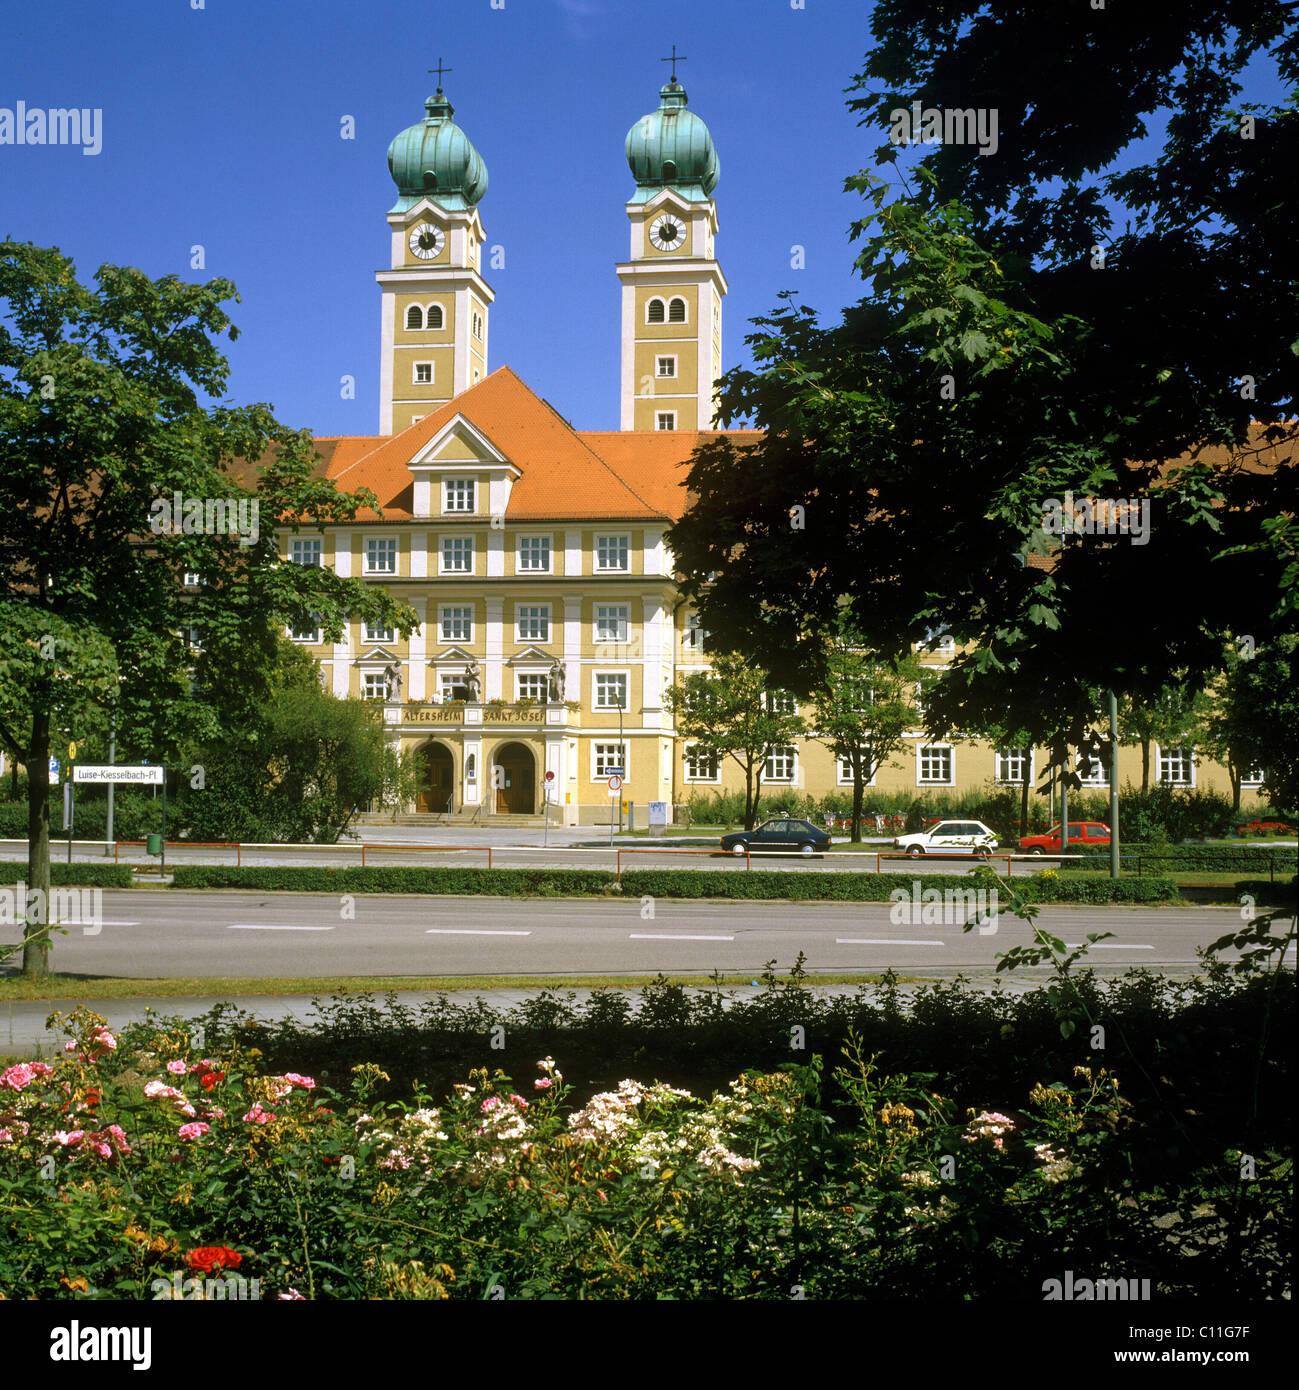 Altenheim St. Josef nursing home, Luise-Kisselbach-Platz square, Munich, Upper Bavaria, Germany, Europe Stock Photo